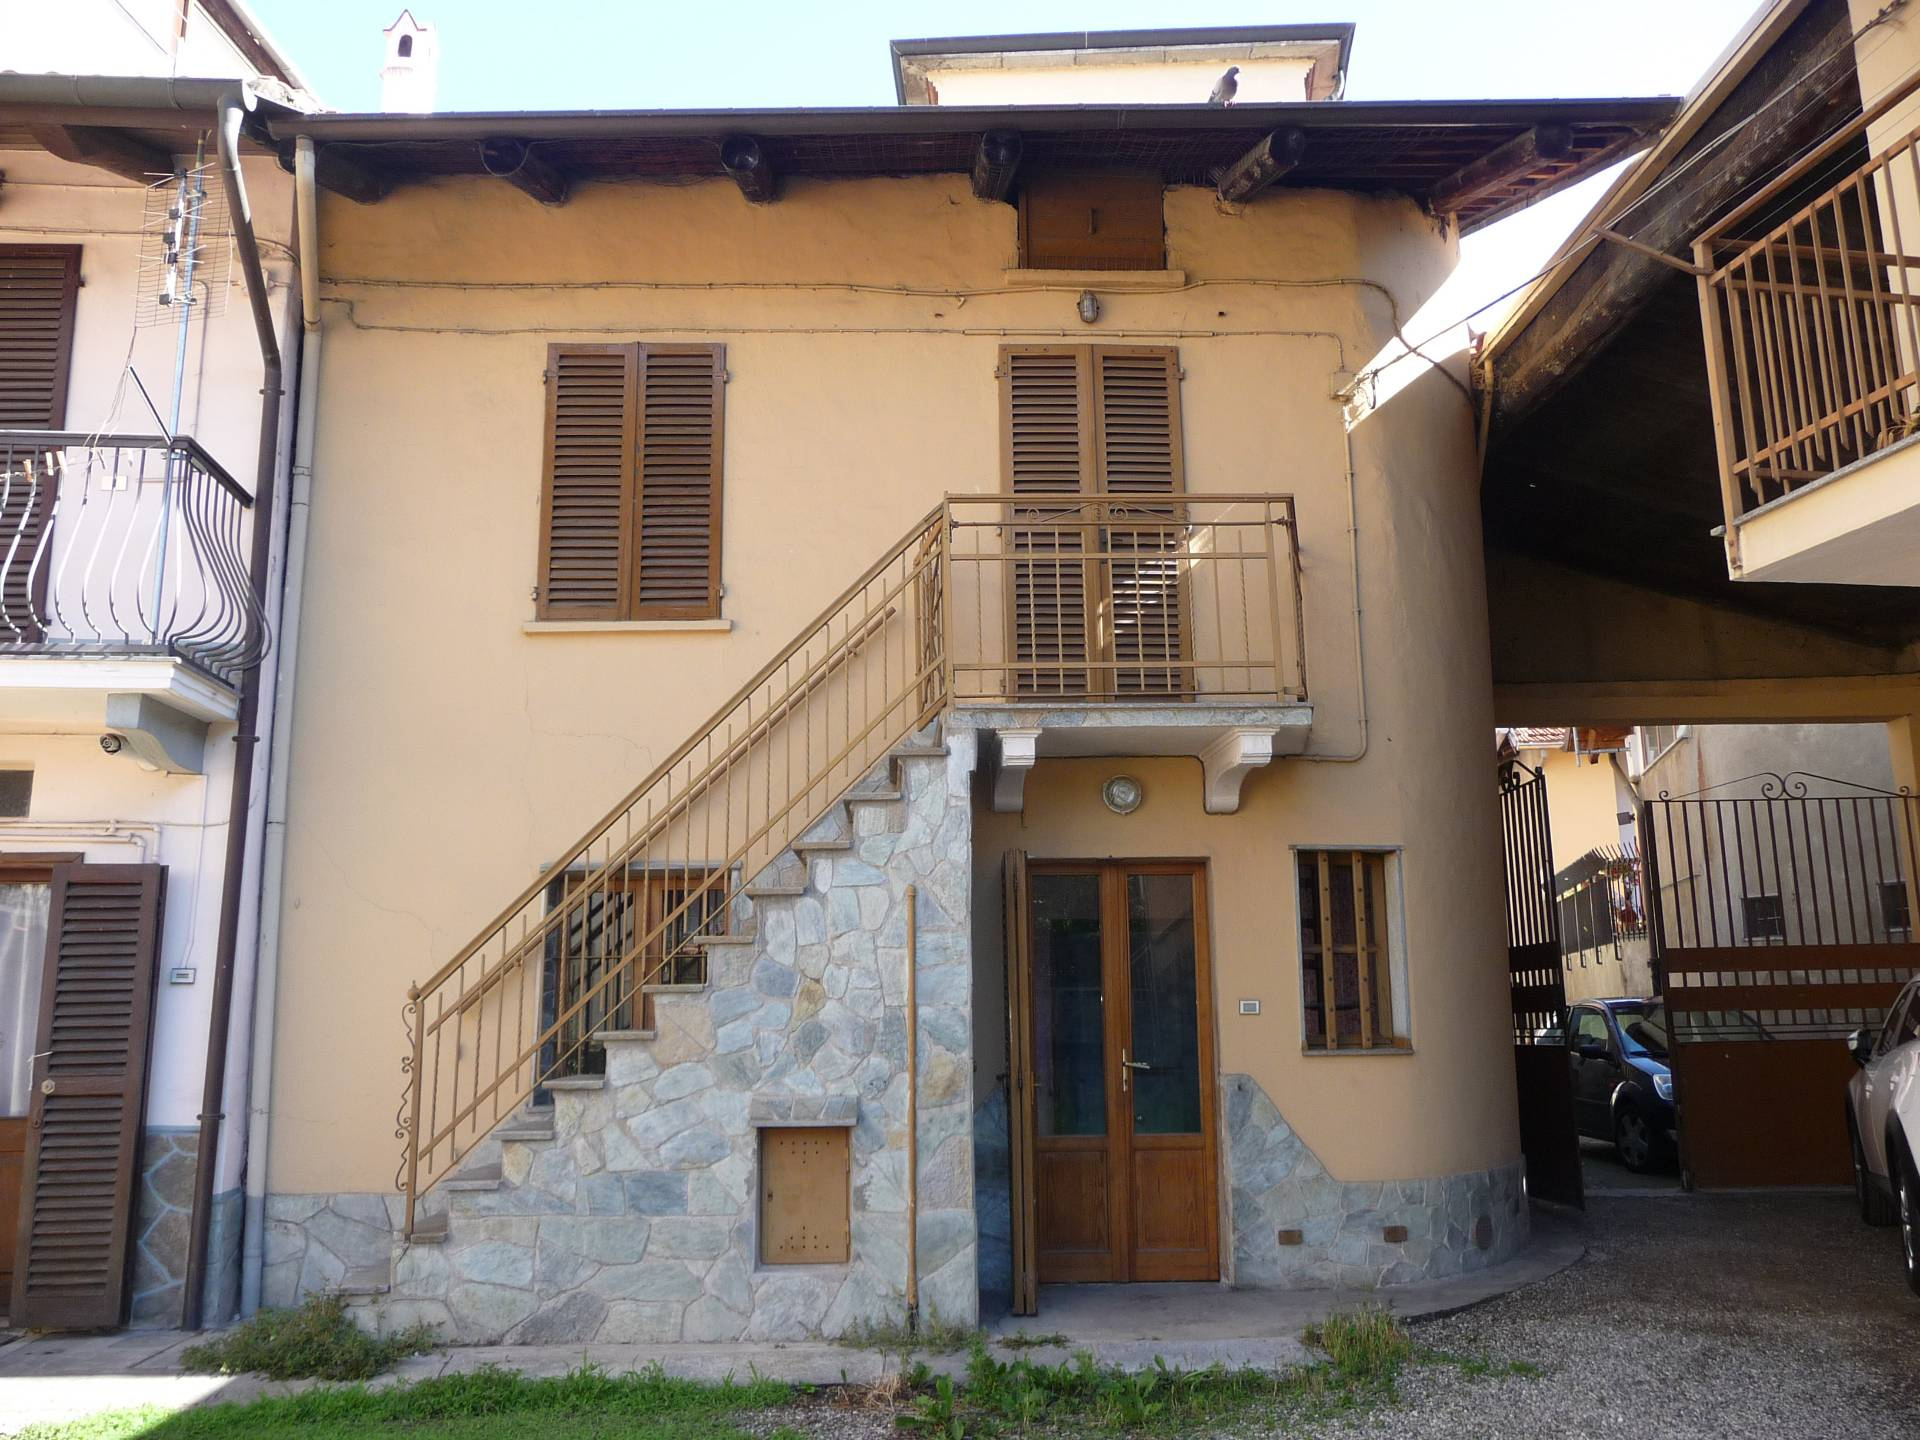 Bilocale Settimo Torinese Via S. Francesco D'assisi 1